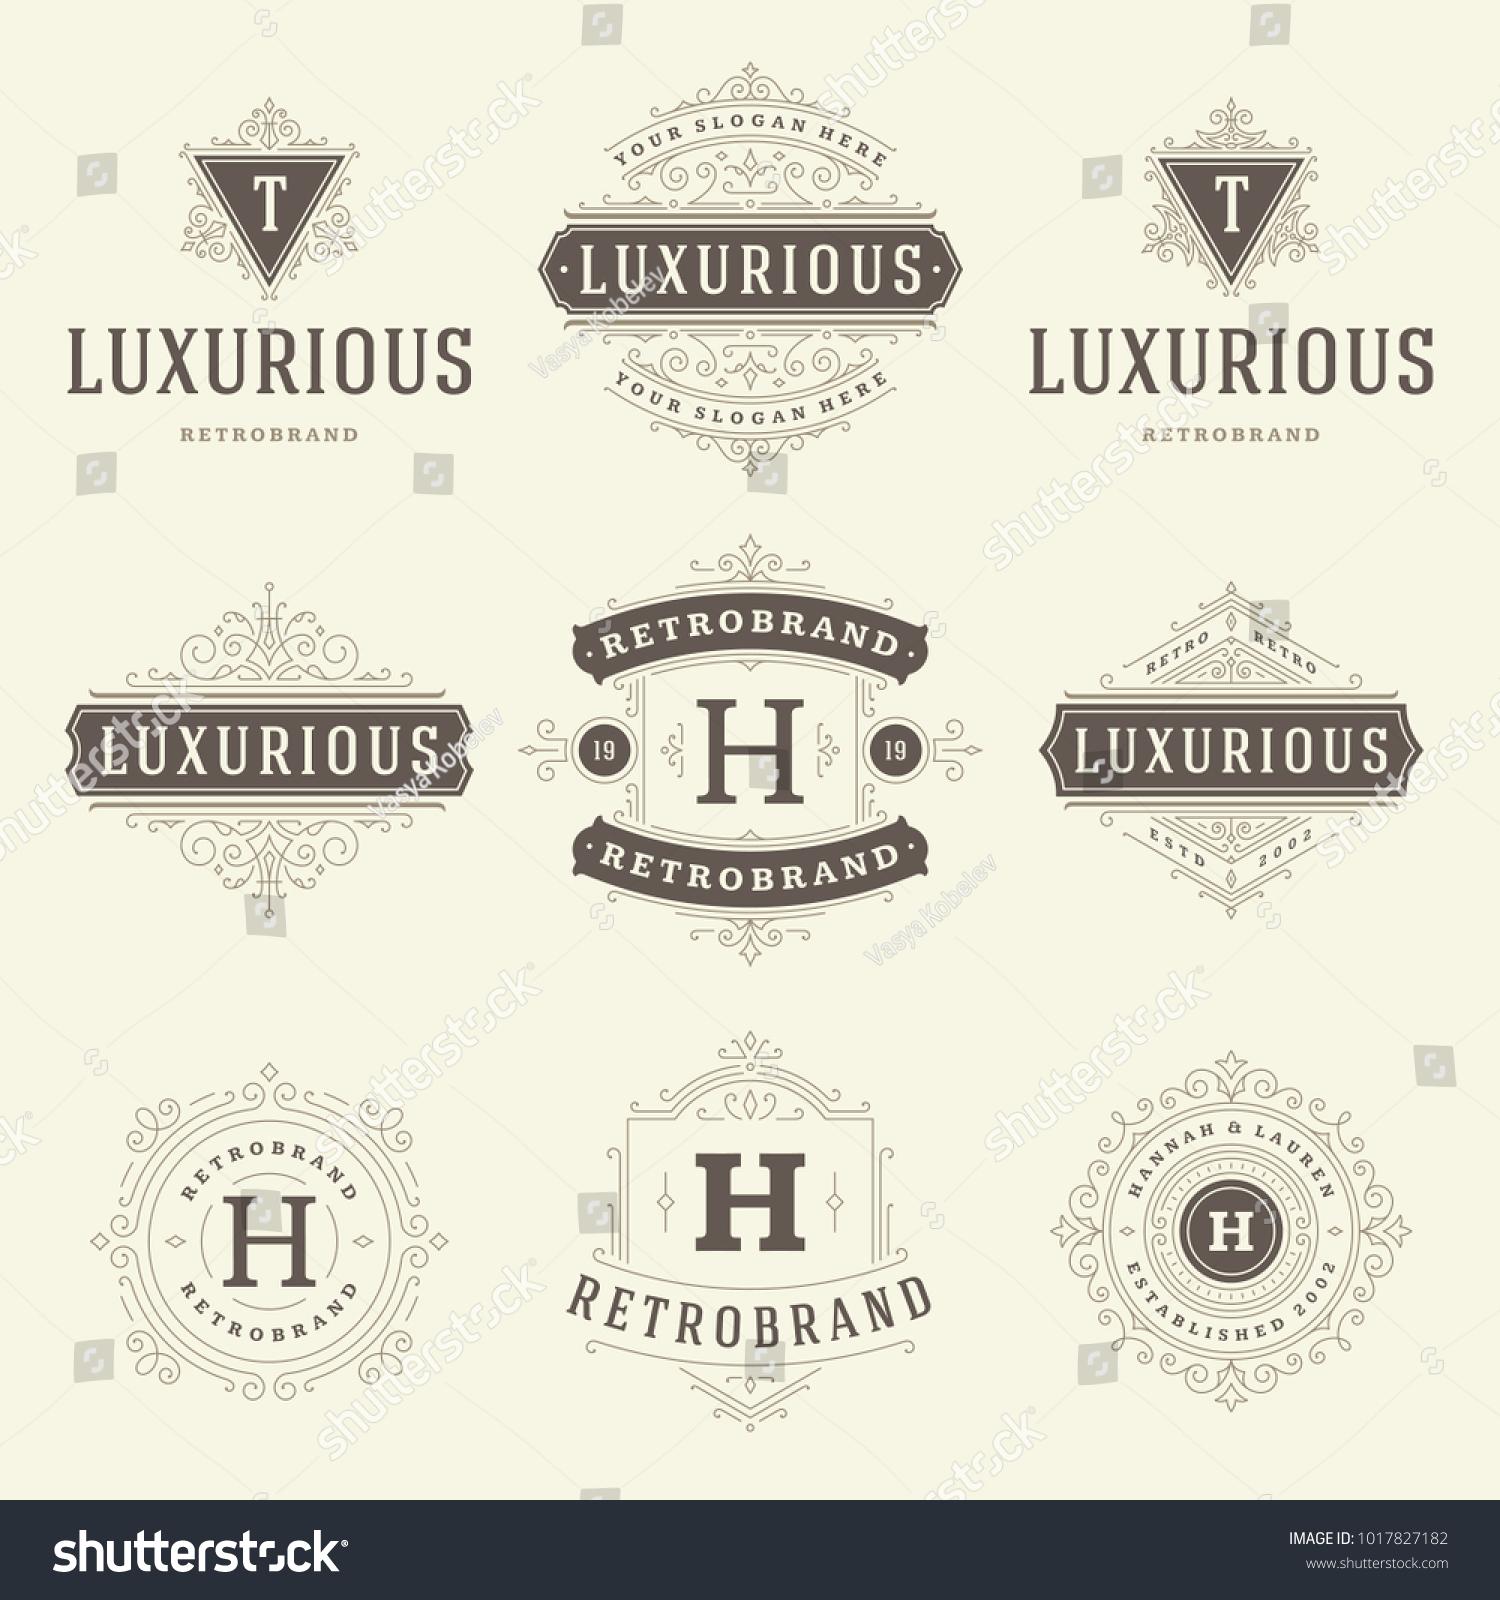 luxury logos templates set flourishes calligraphic stock vector